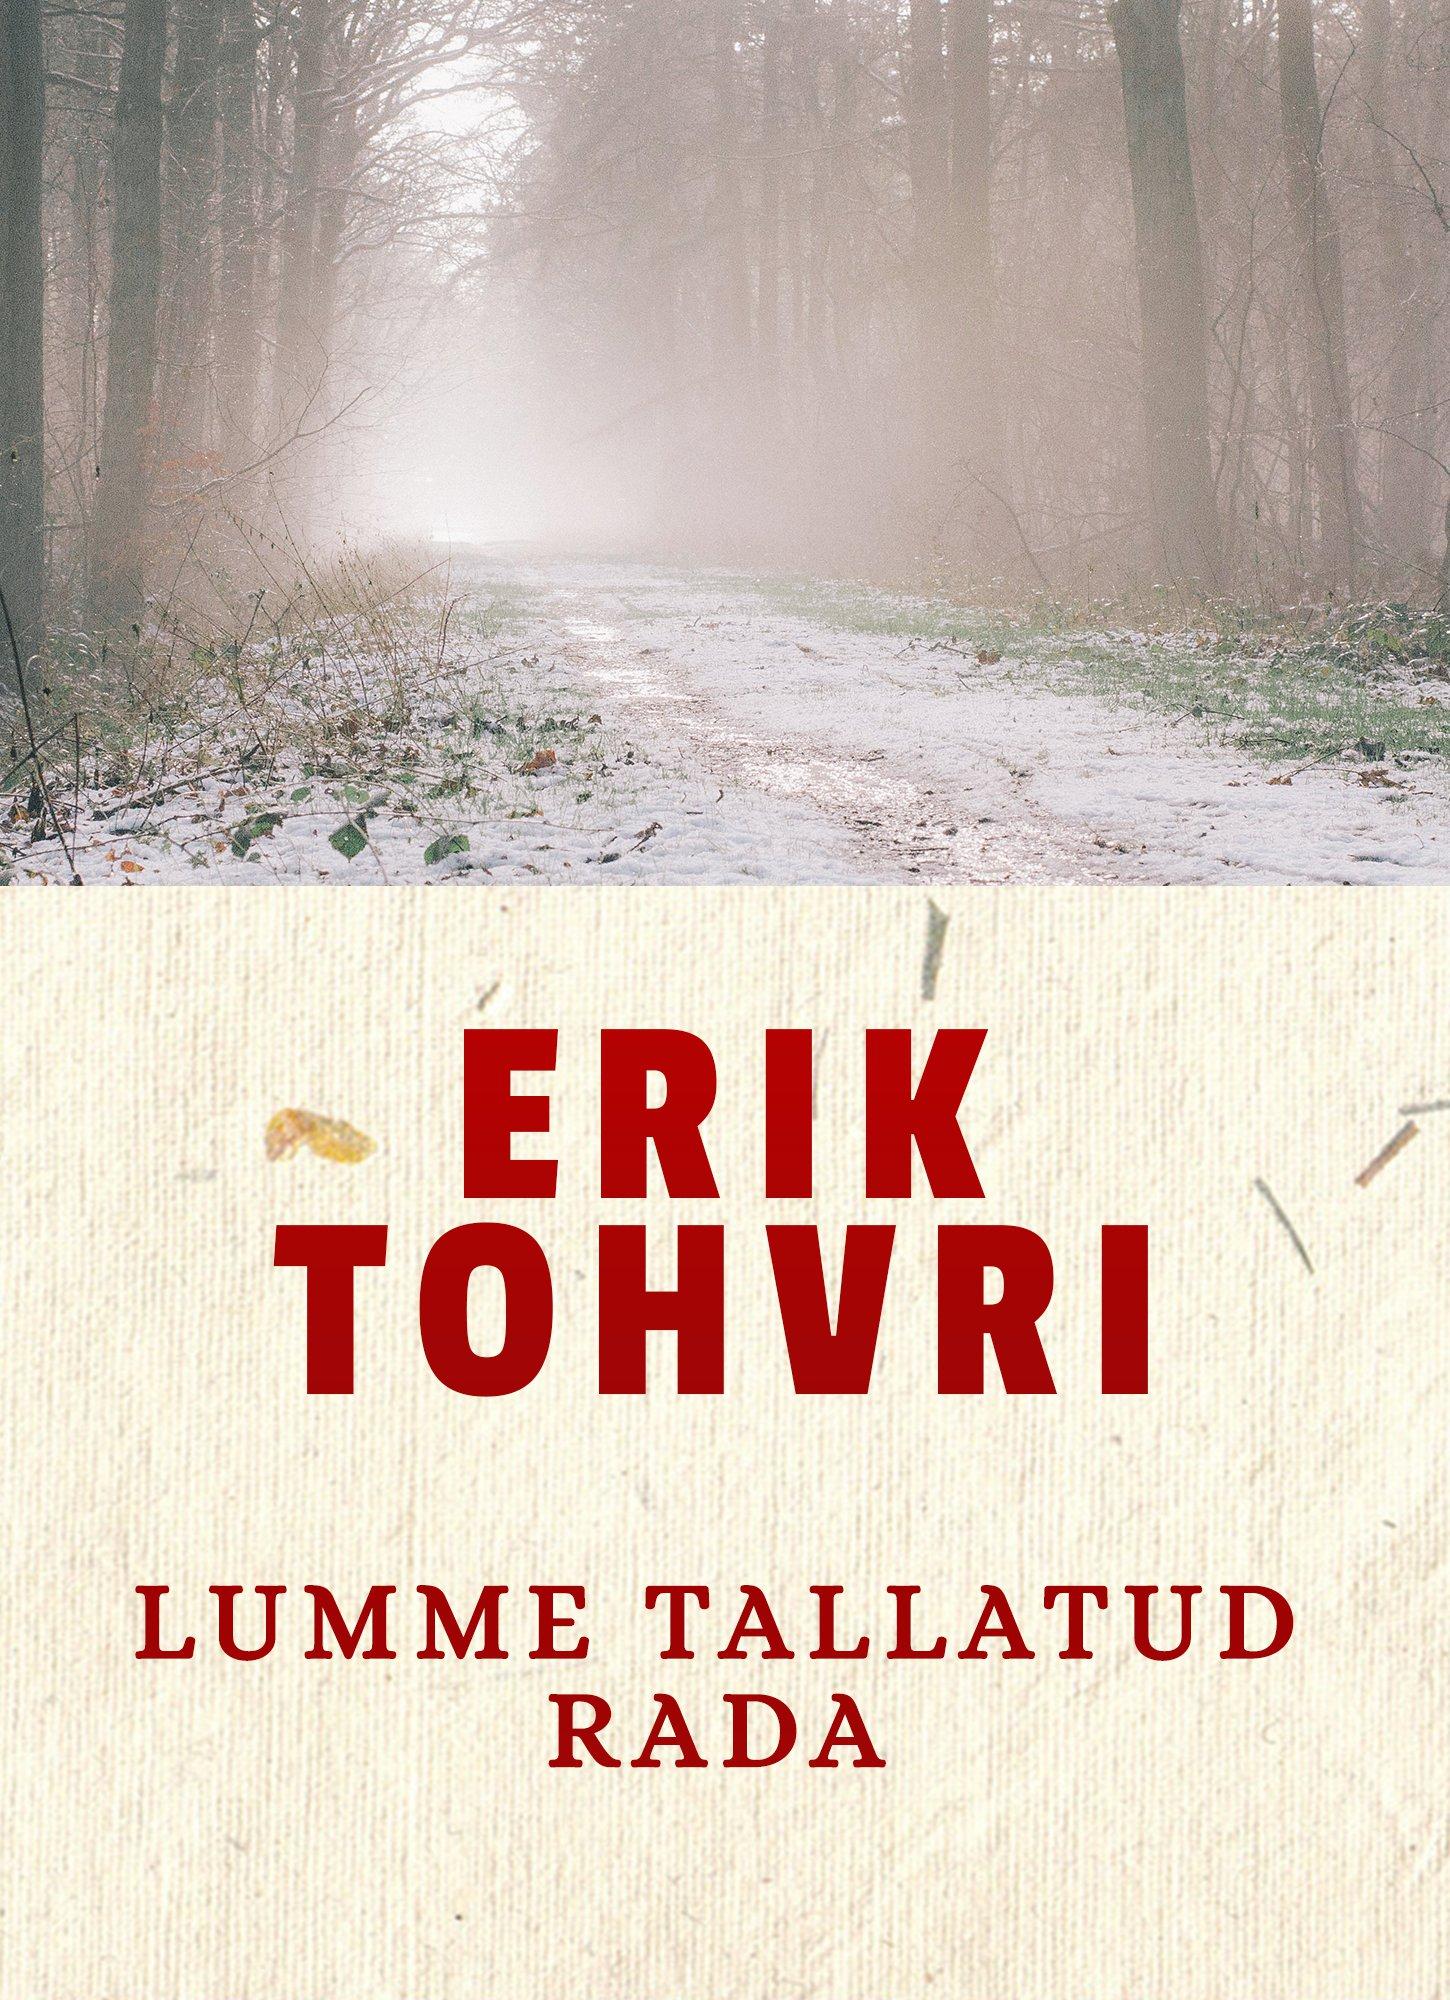 Erik Tohvri Lumme tallatud rada erik tohvri kodutute küla ii sulasest sai peremees